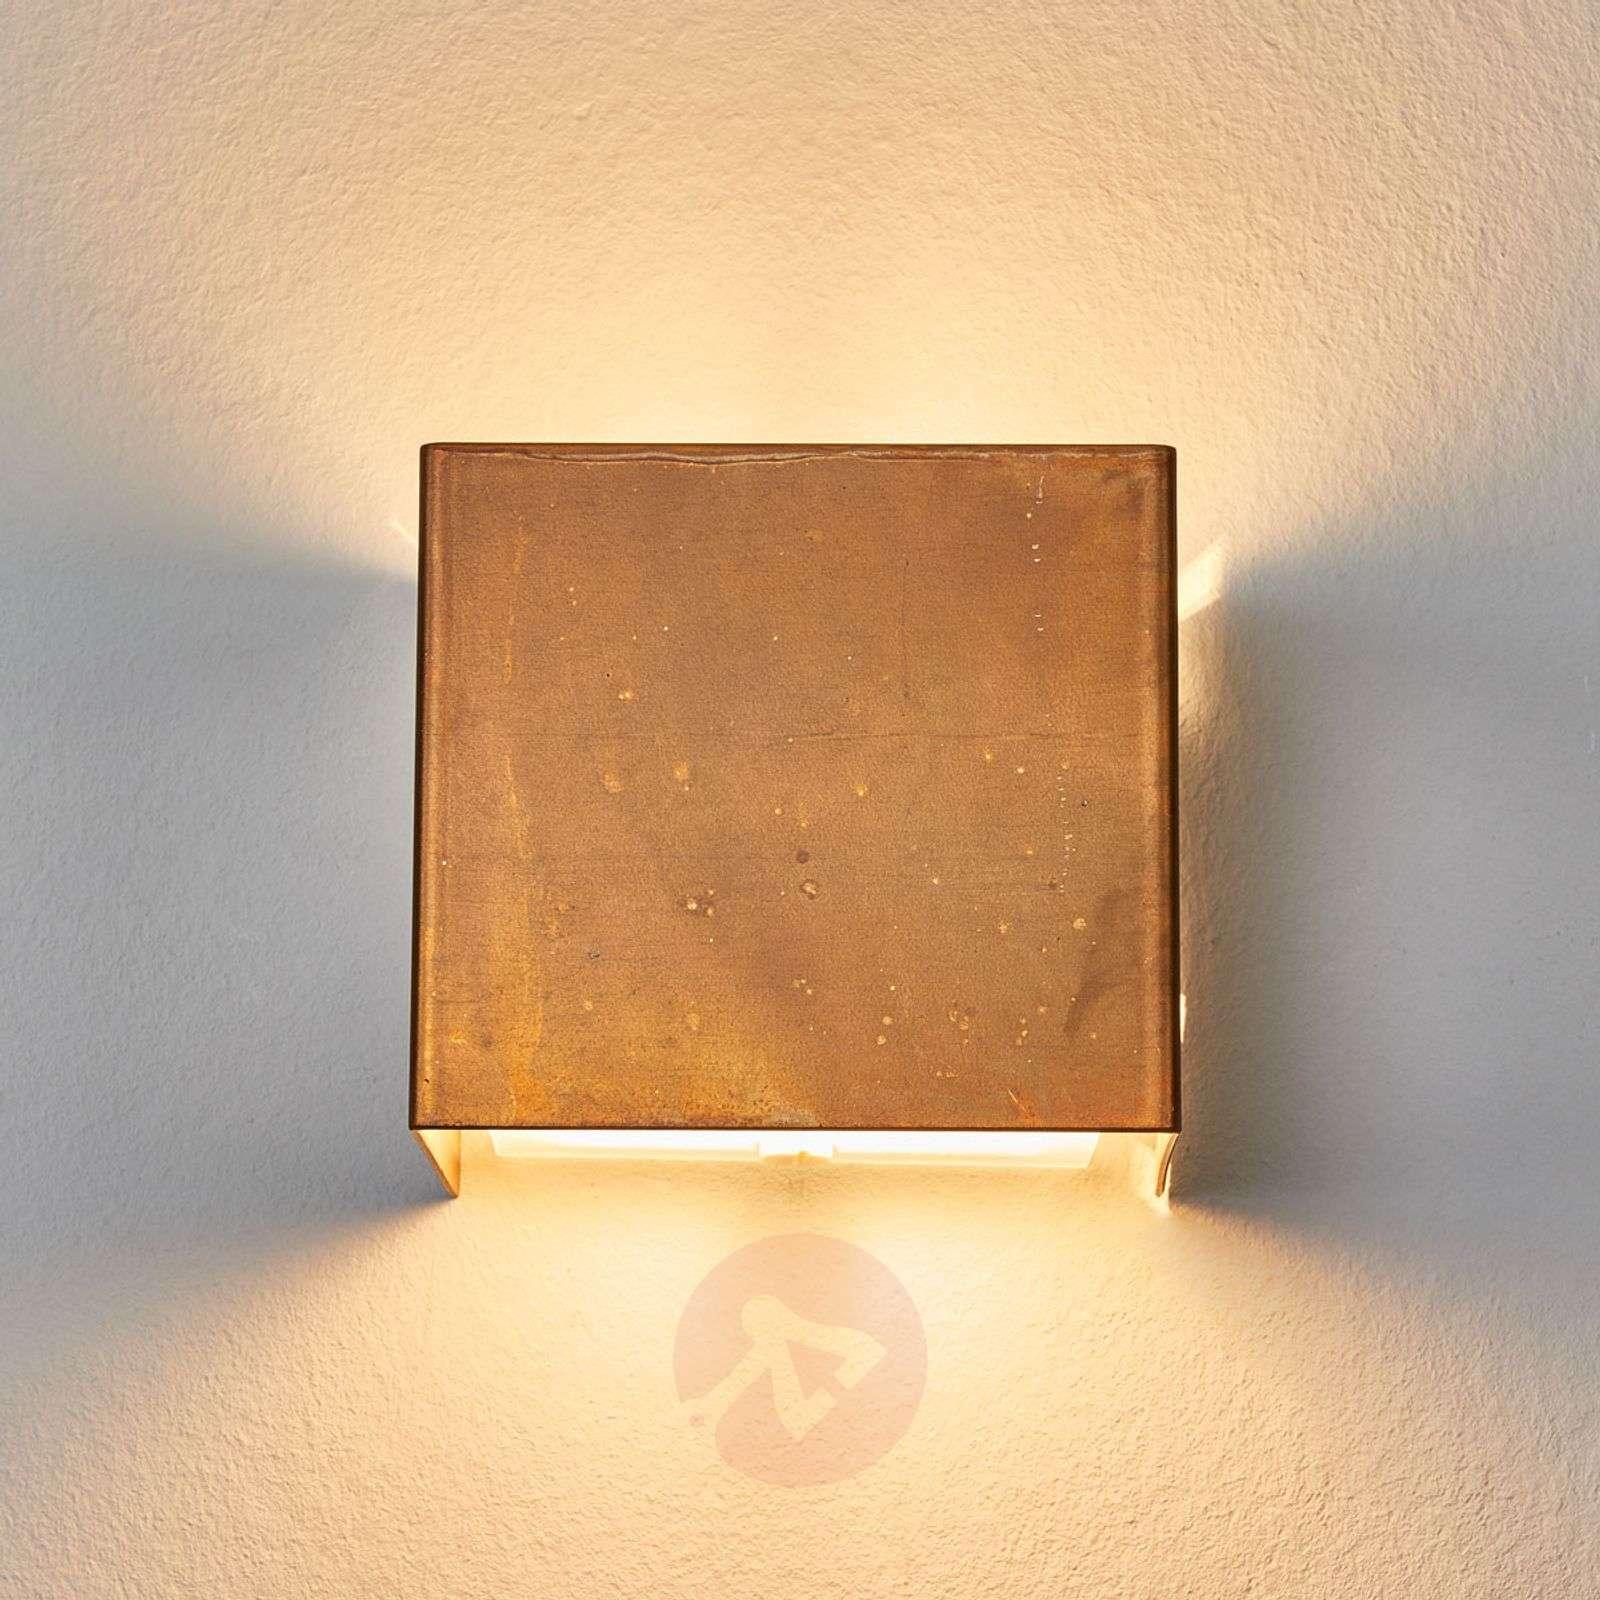 Wall lamp LOLA with oxidized brass-4011107-01